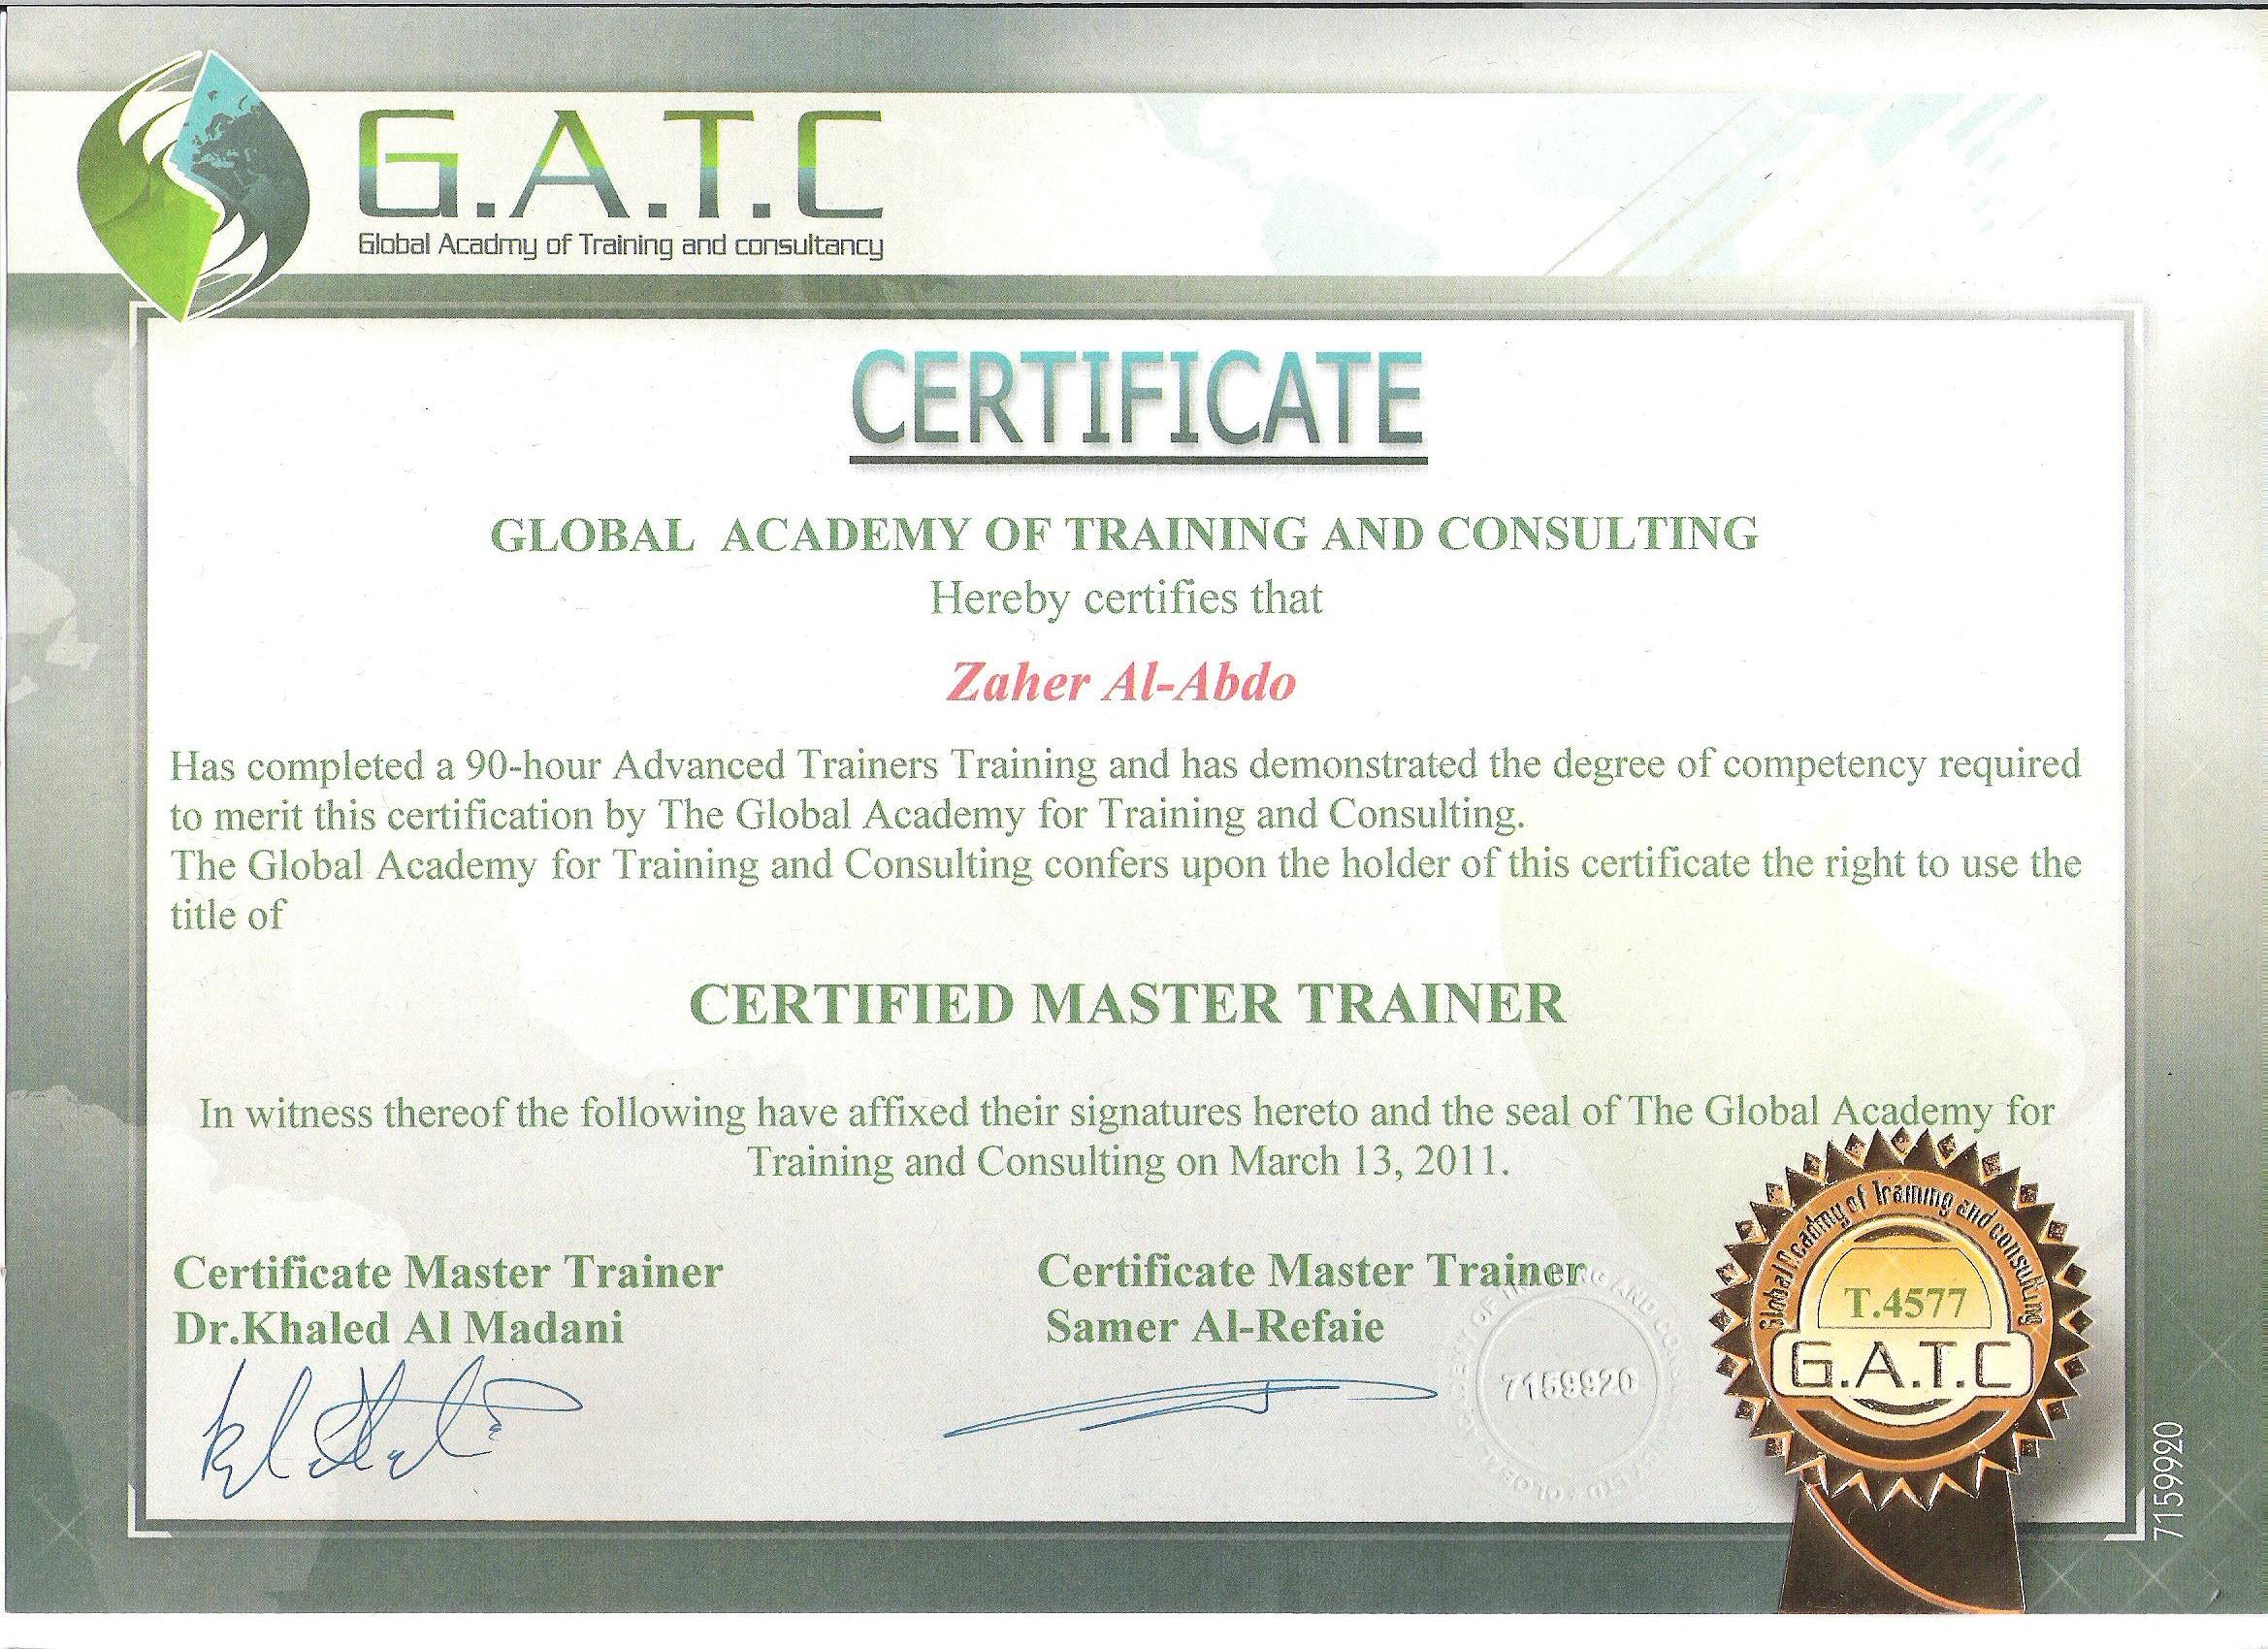 شهادات تدريب زاهر بشير العبدو zaher alabdo training certificates zaherabdo.com #zbabdo